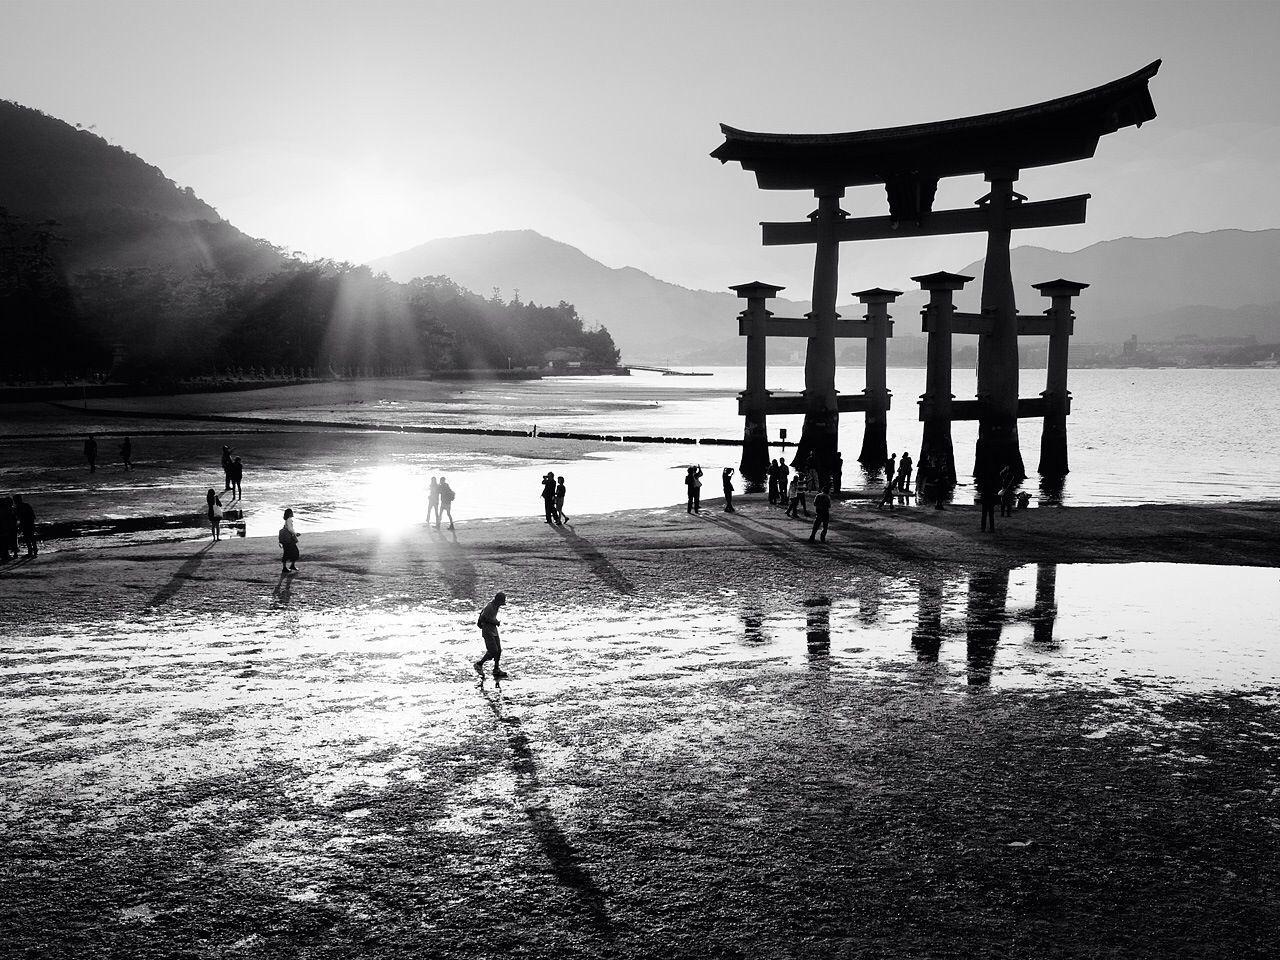 Silhouette column structure at beach